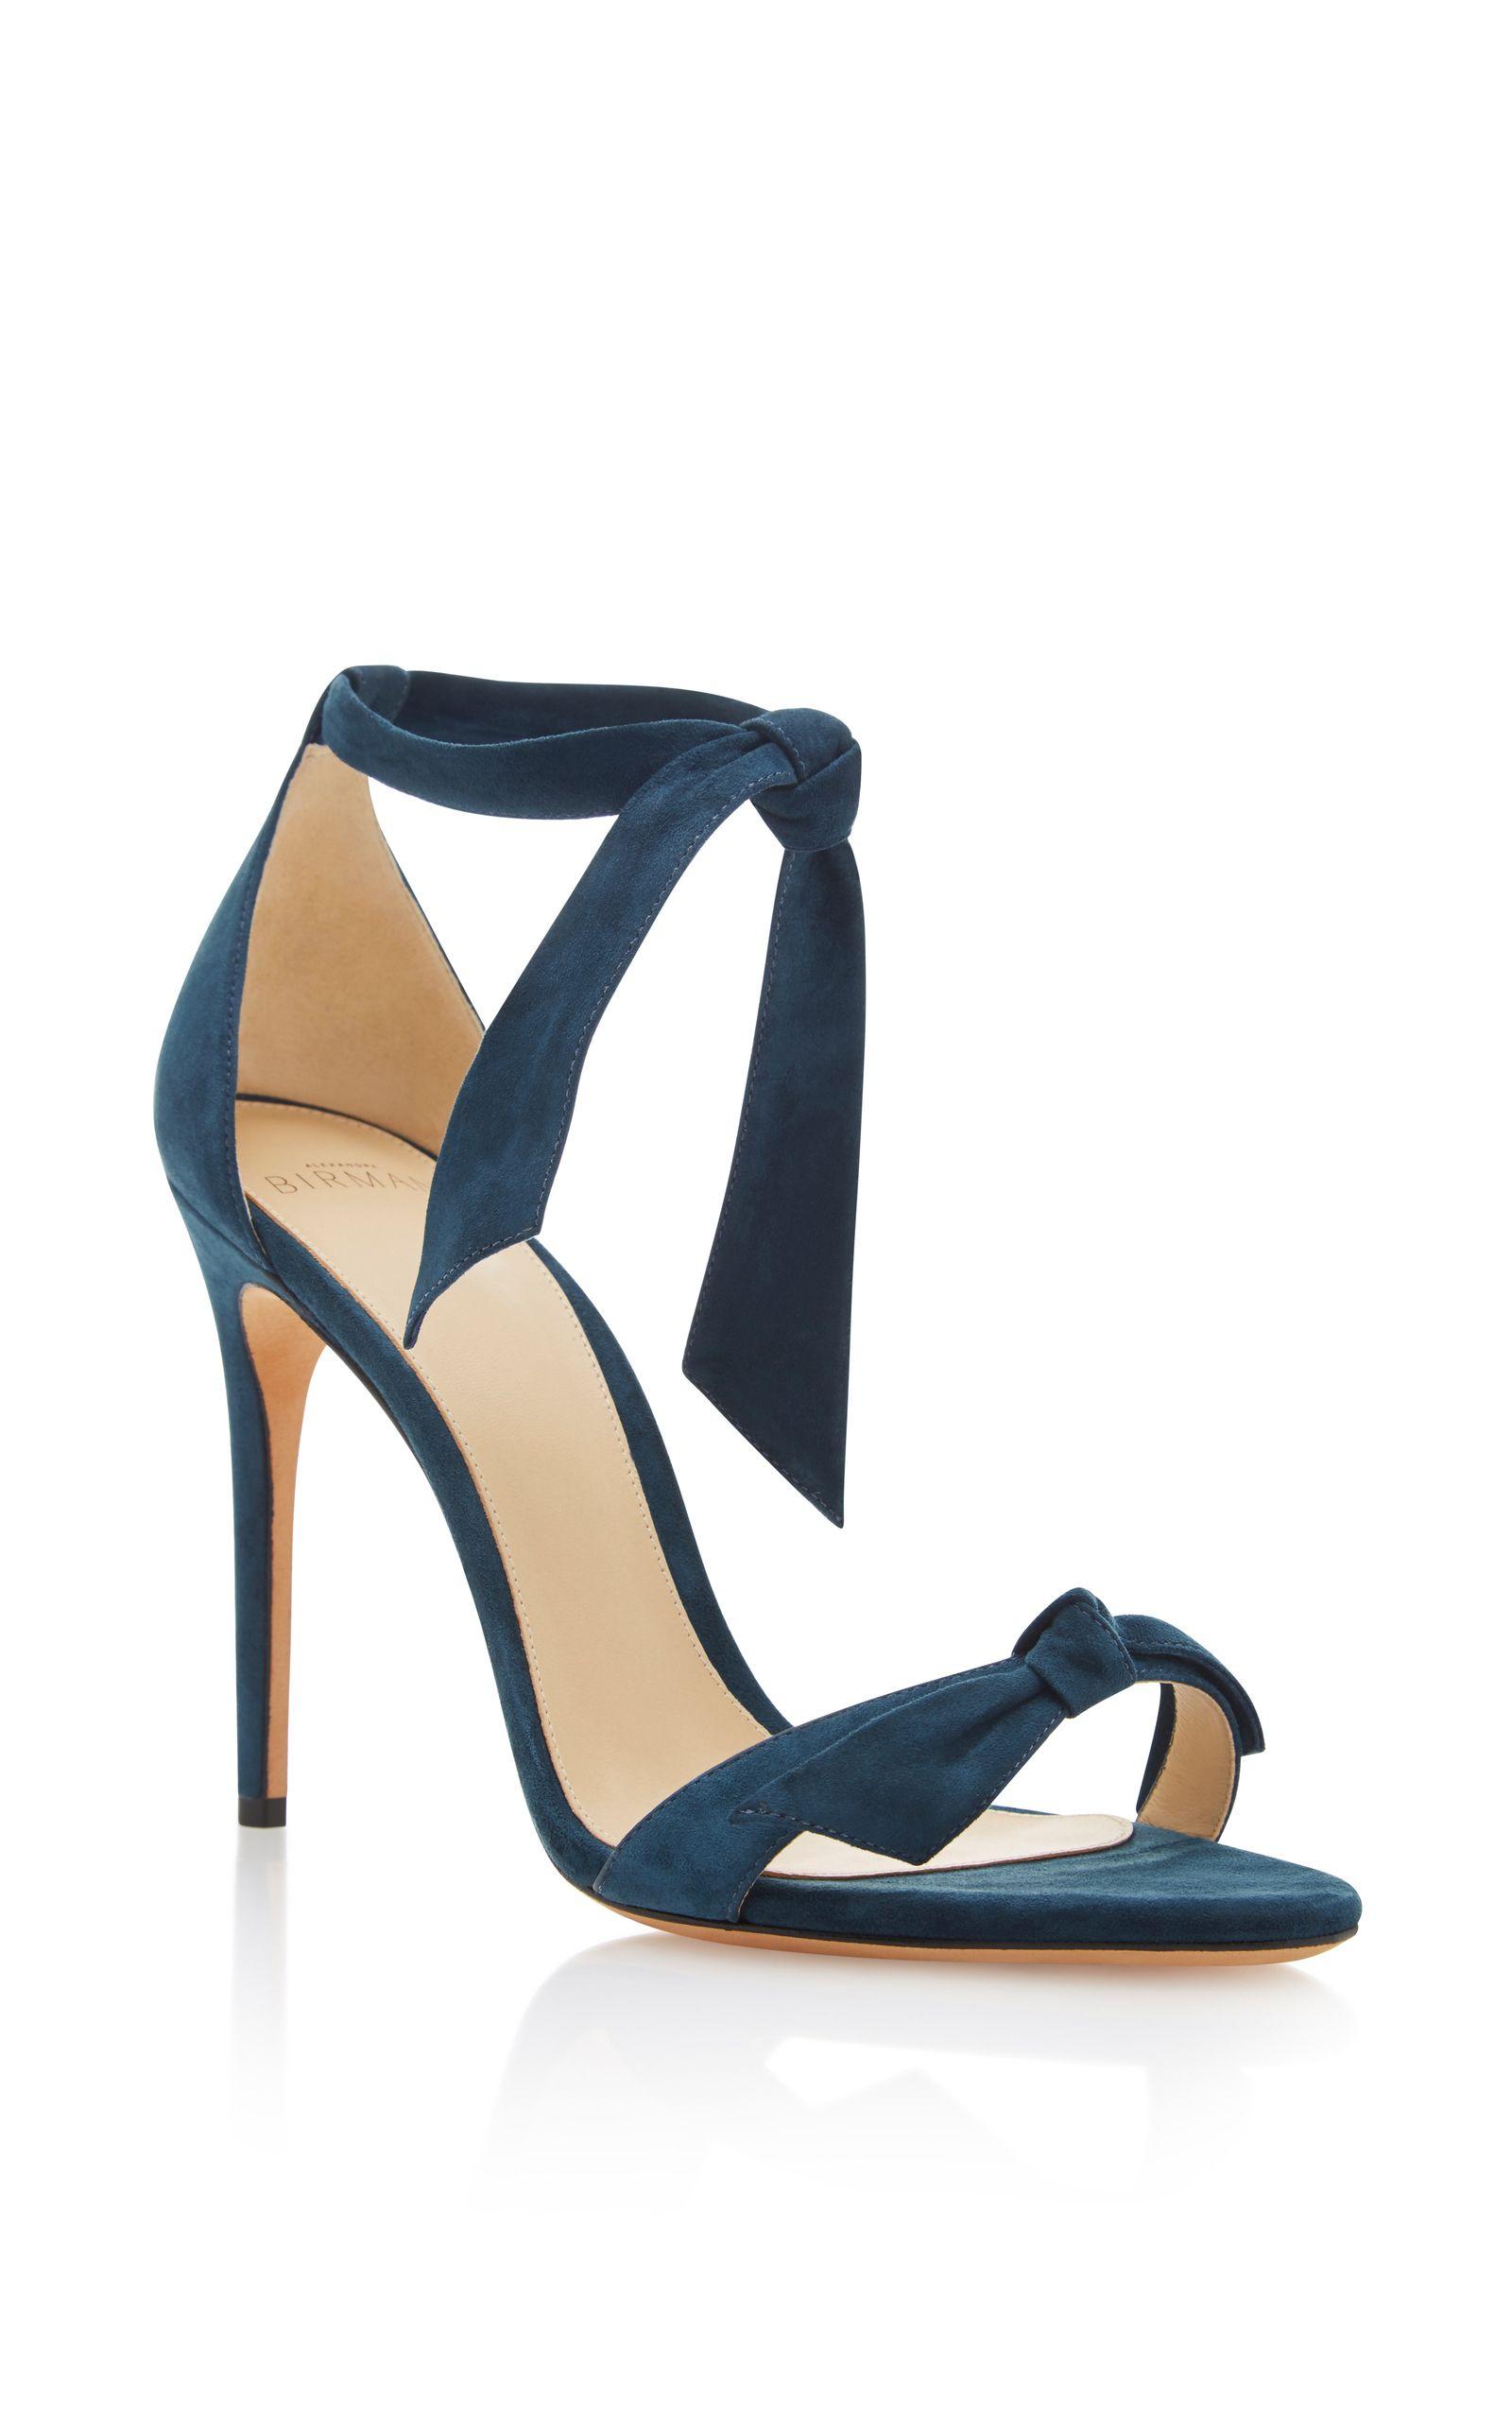 Chaussures - Bottes À La Cheville Alexandre Birman O9TiAqxfN